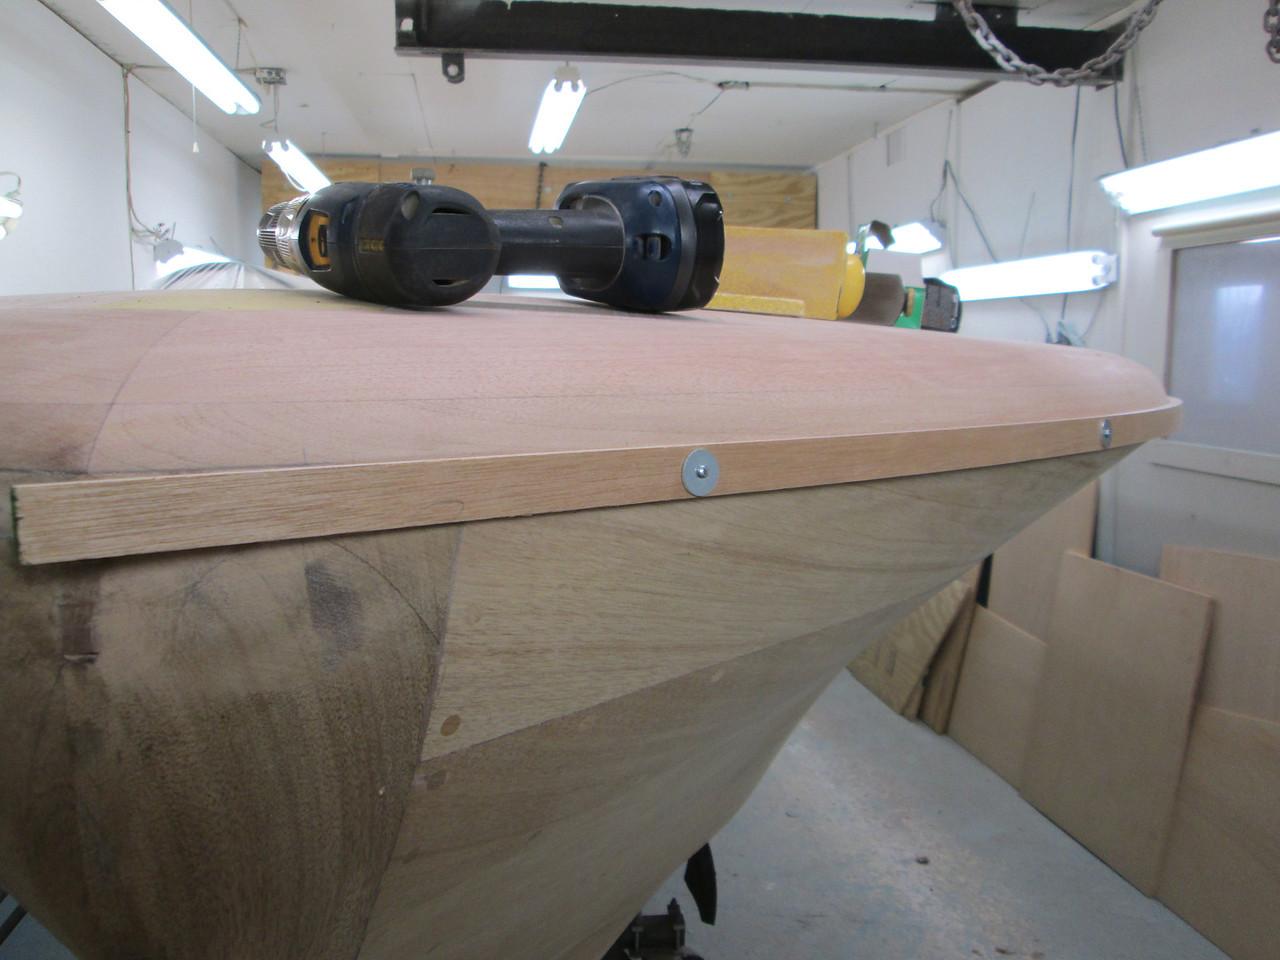 Front port rub rail cleat fit.